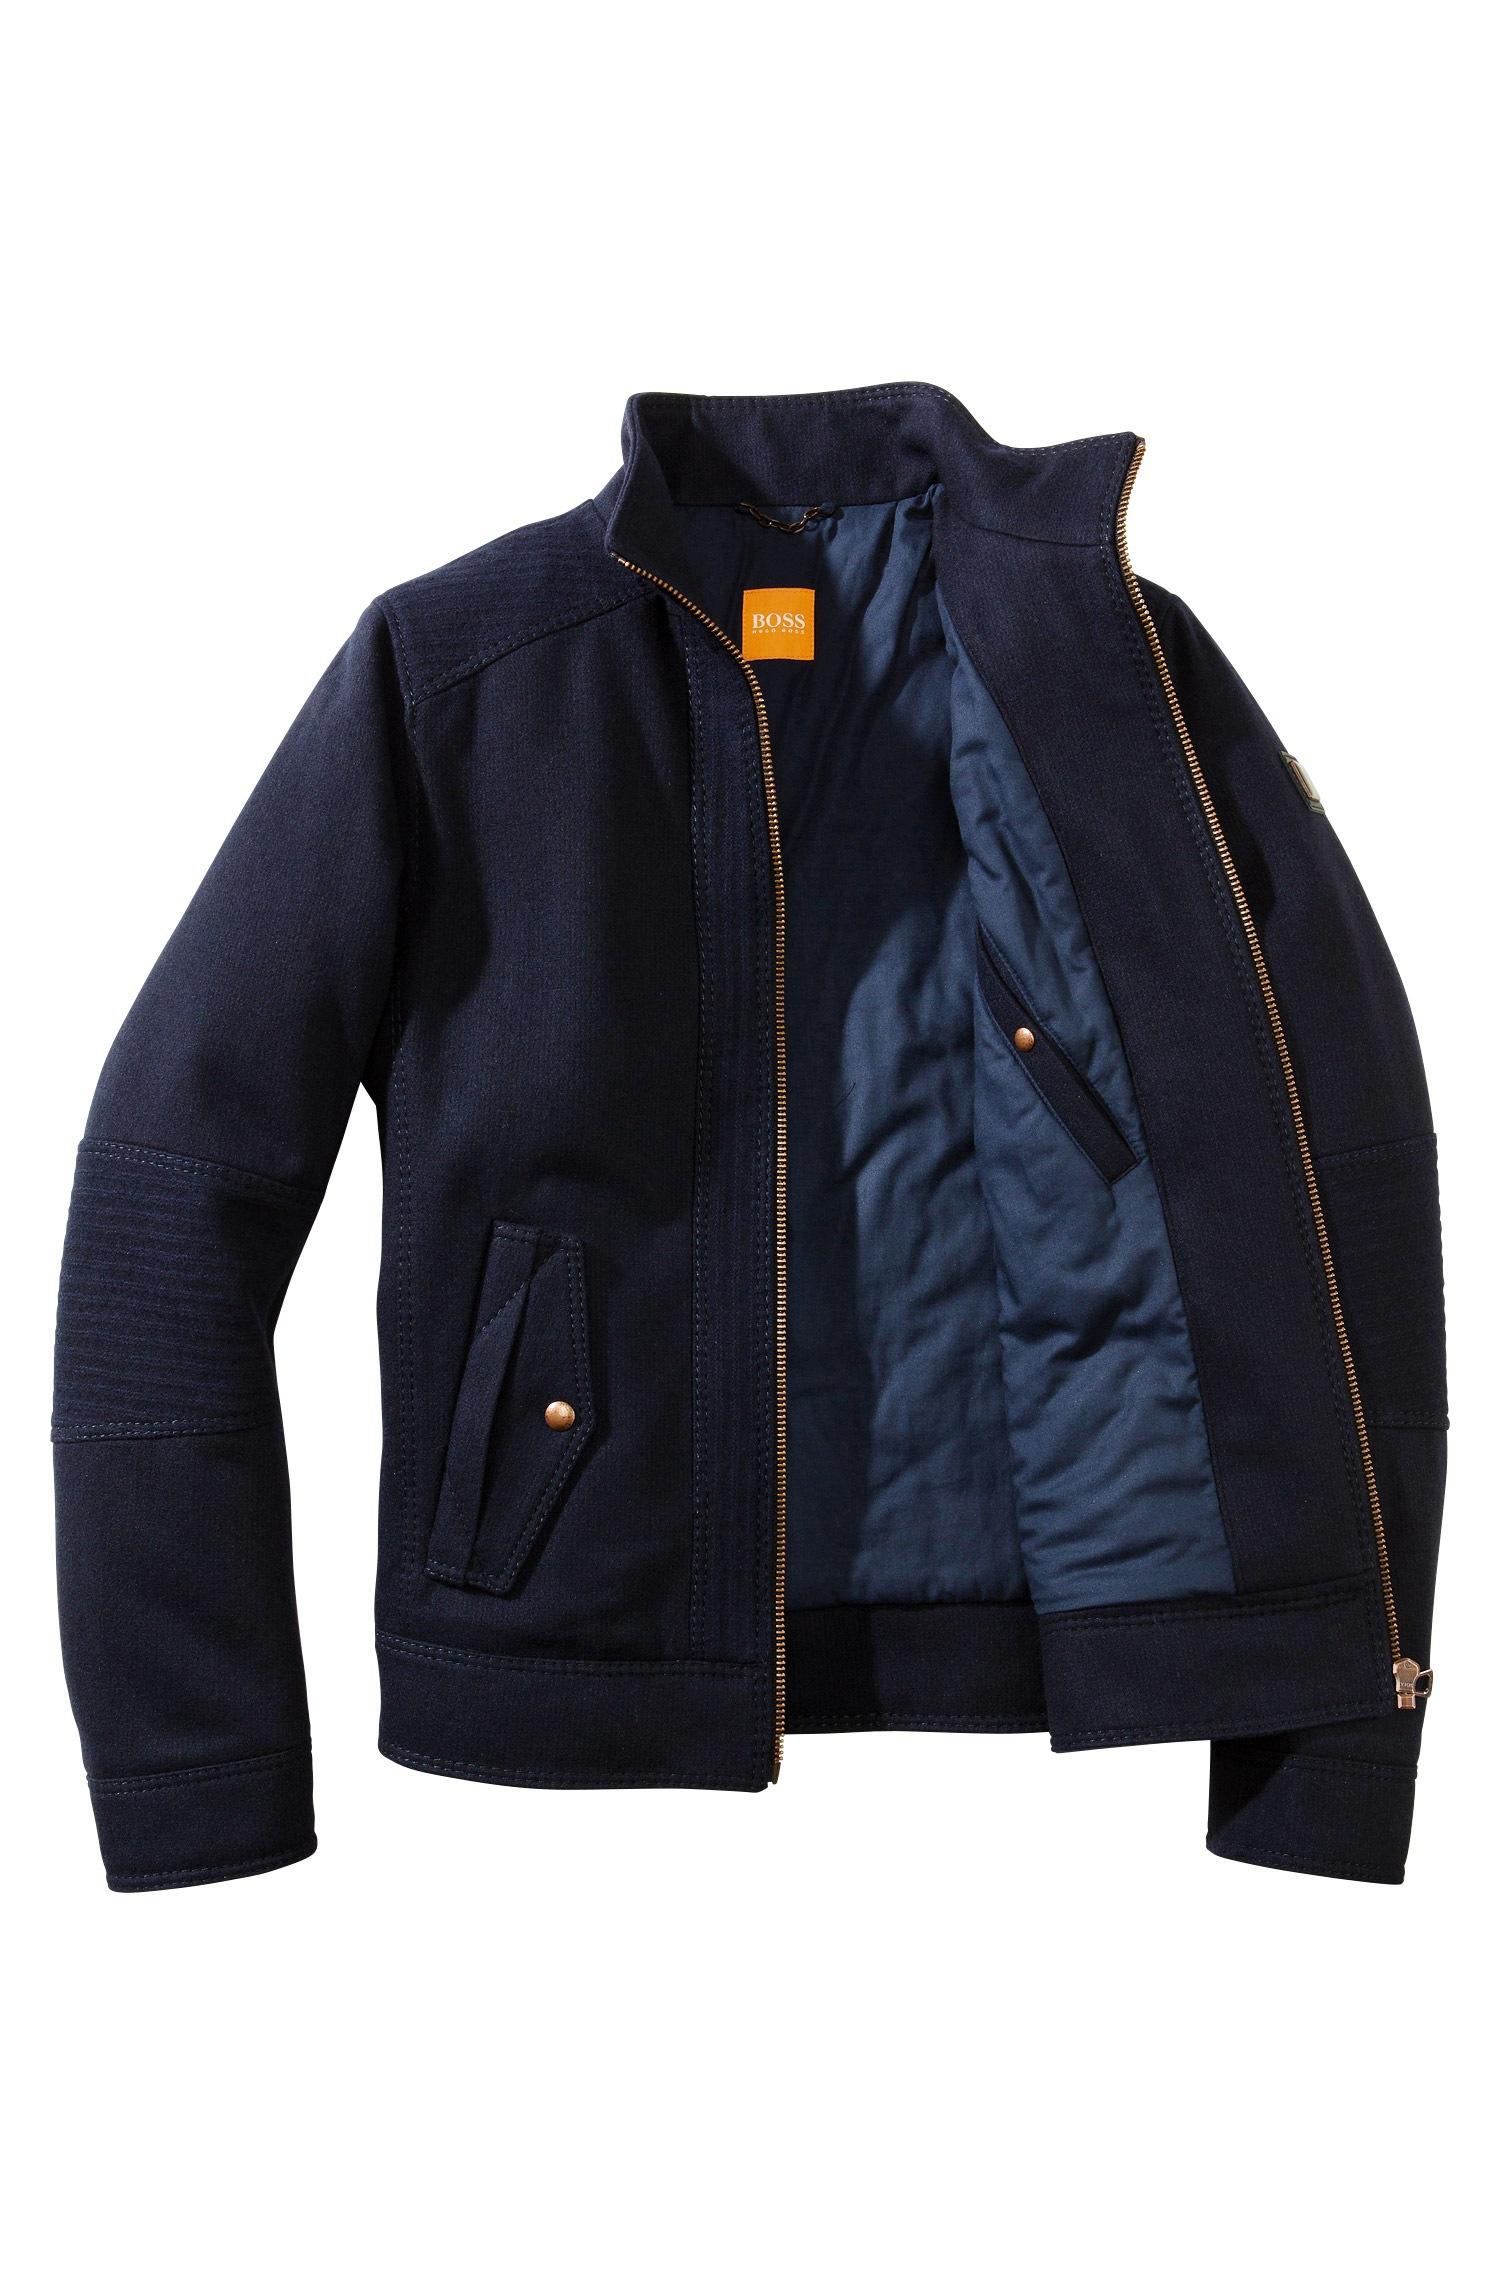 lyst boss orange jacket 39 onzoom 39 in a wool blend in blue. Black Bedroom Furniture Sets. Home Design Ideas